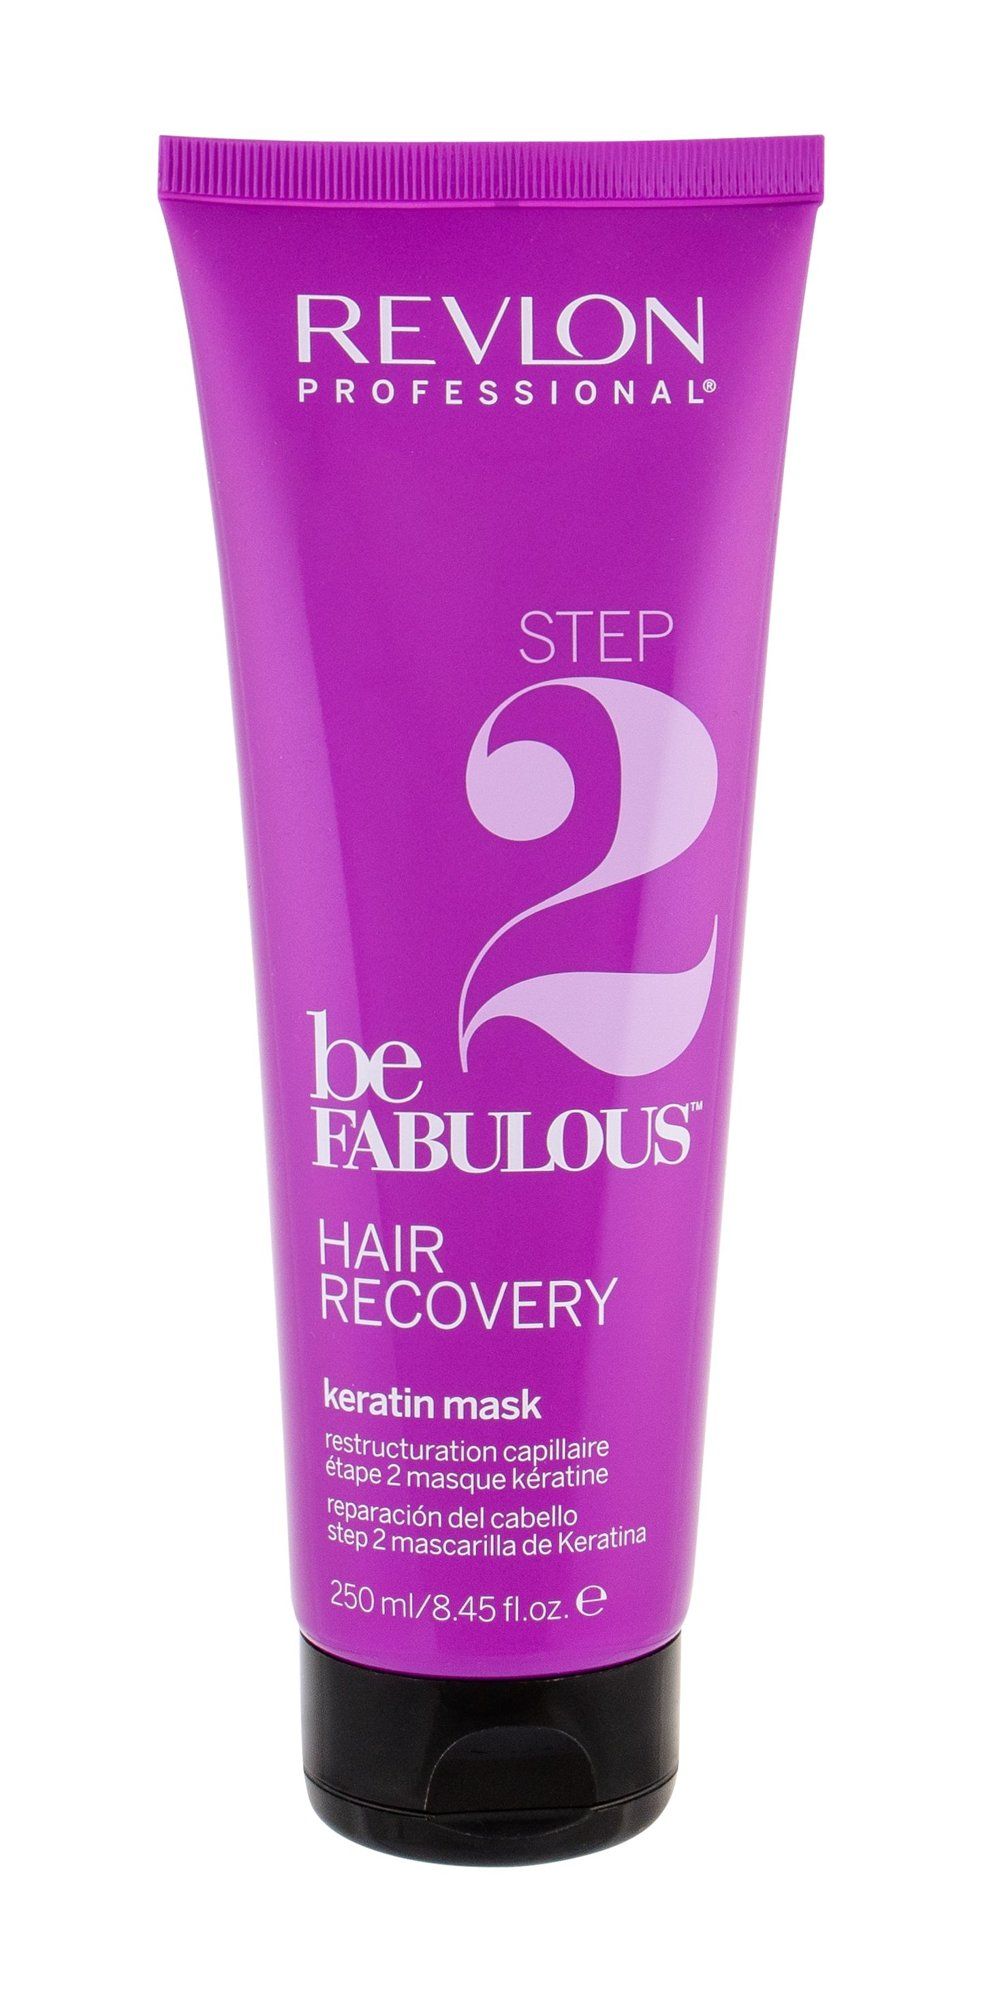 Revlon Professional Be Fabulous Hair Mask 250ml